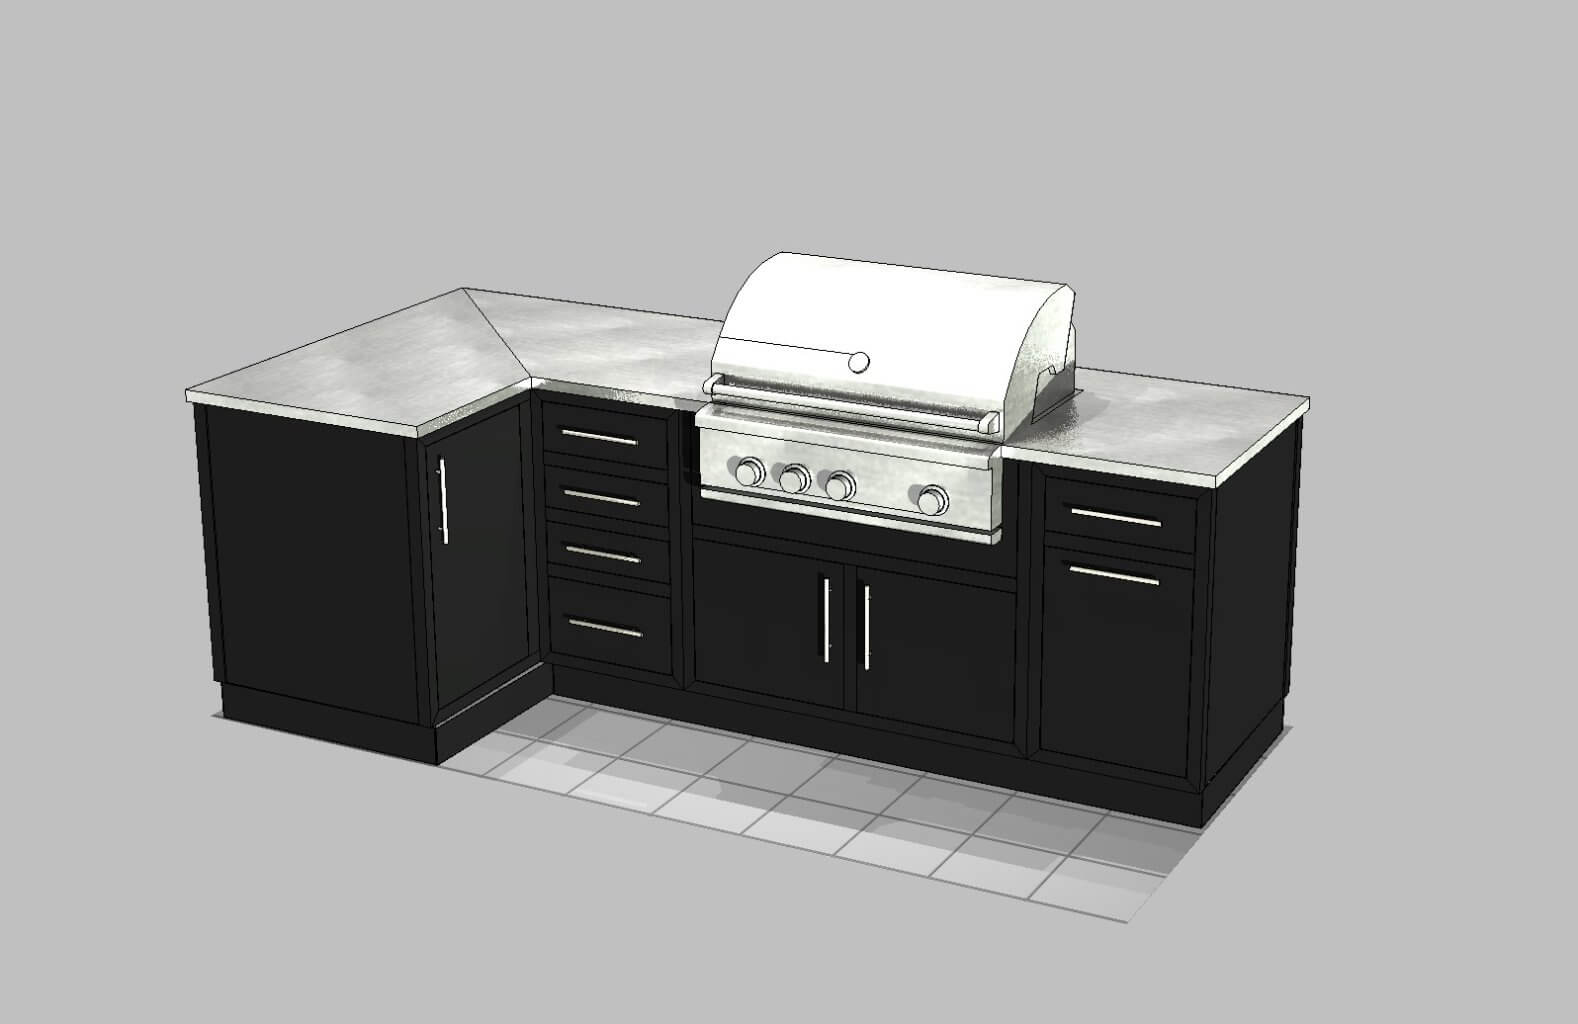 3D Textured Black L Shaped Outdoor Kitchen